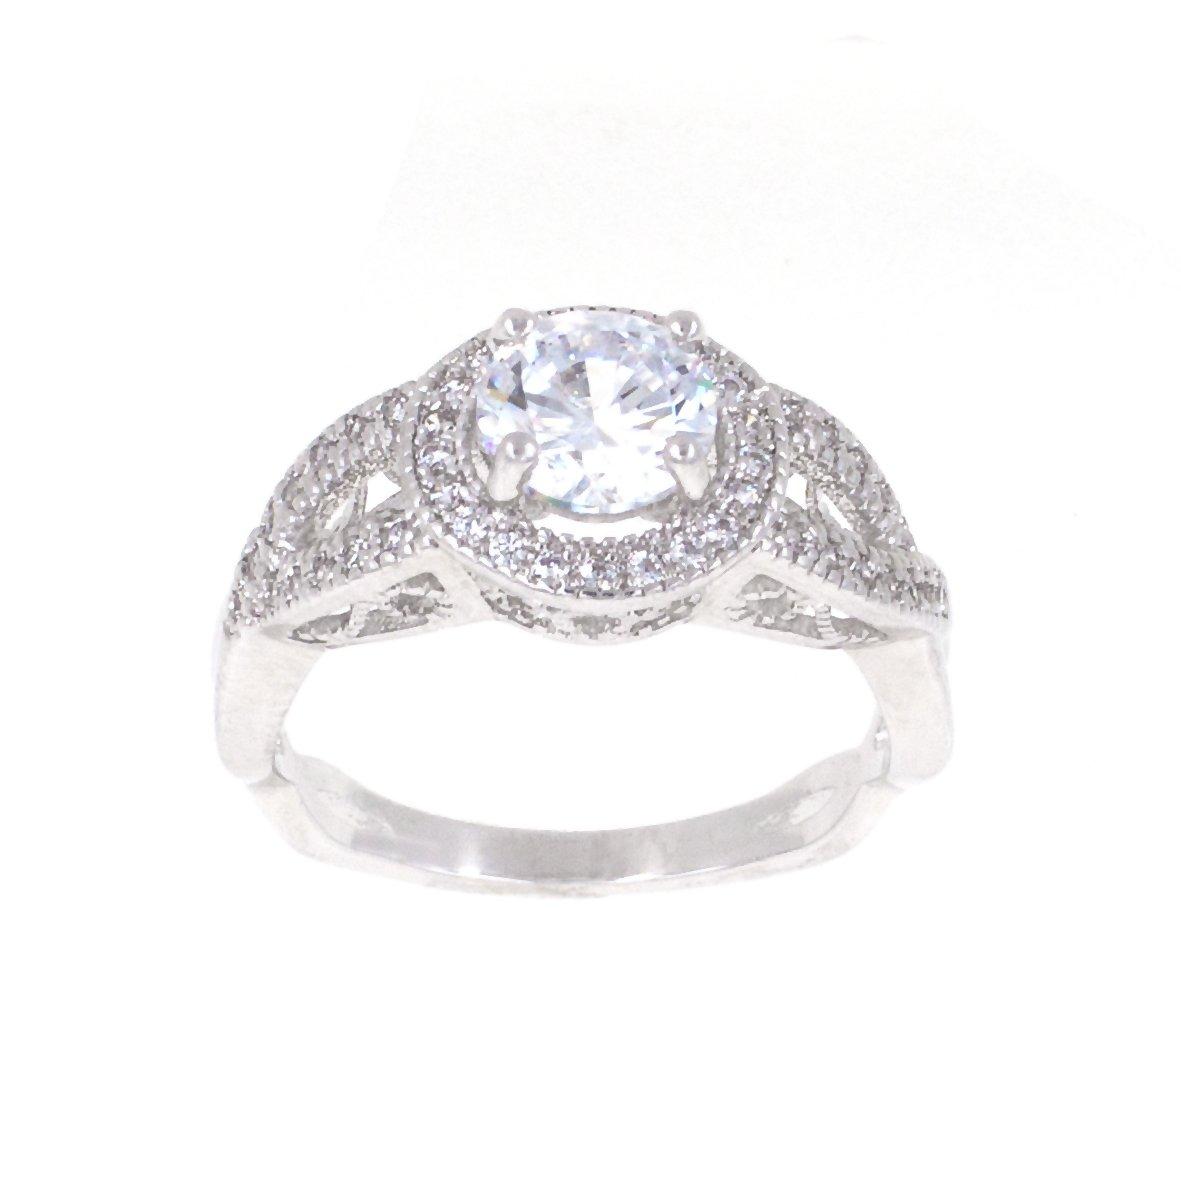 Round Diamond Cut Eternity Love Twisting Split Shank Engagement Ring Size 5-10 Jewelry (Silver, 5)